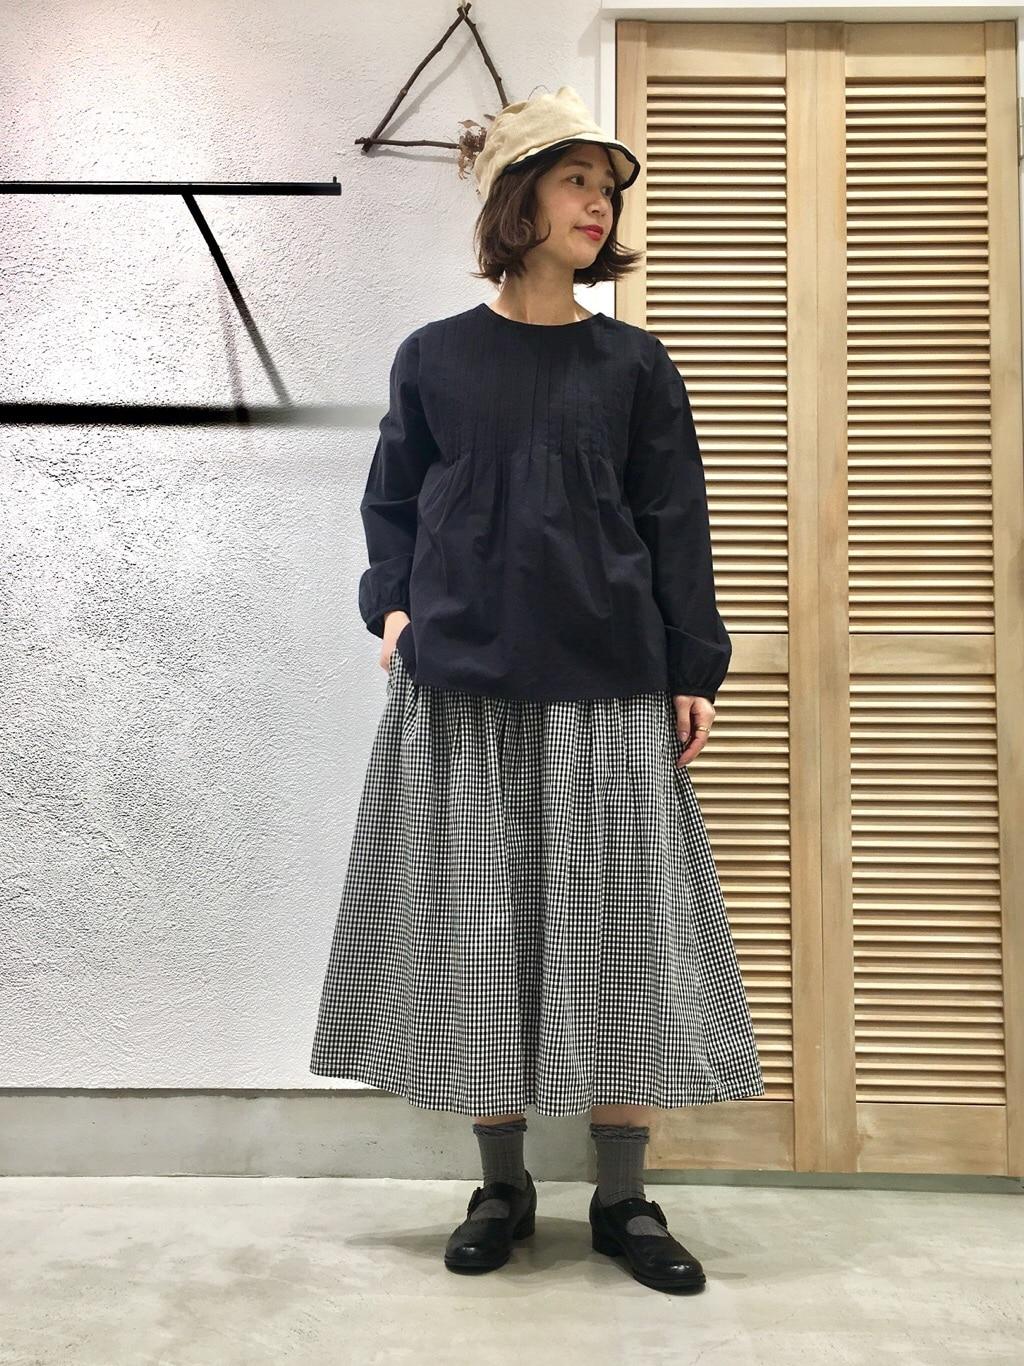 chambre de charme 横浜ジョイナス 身長:160cm 2021.02.20